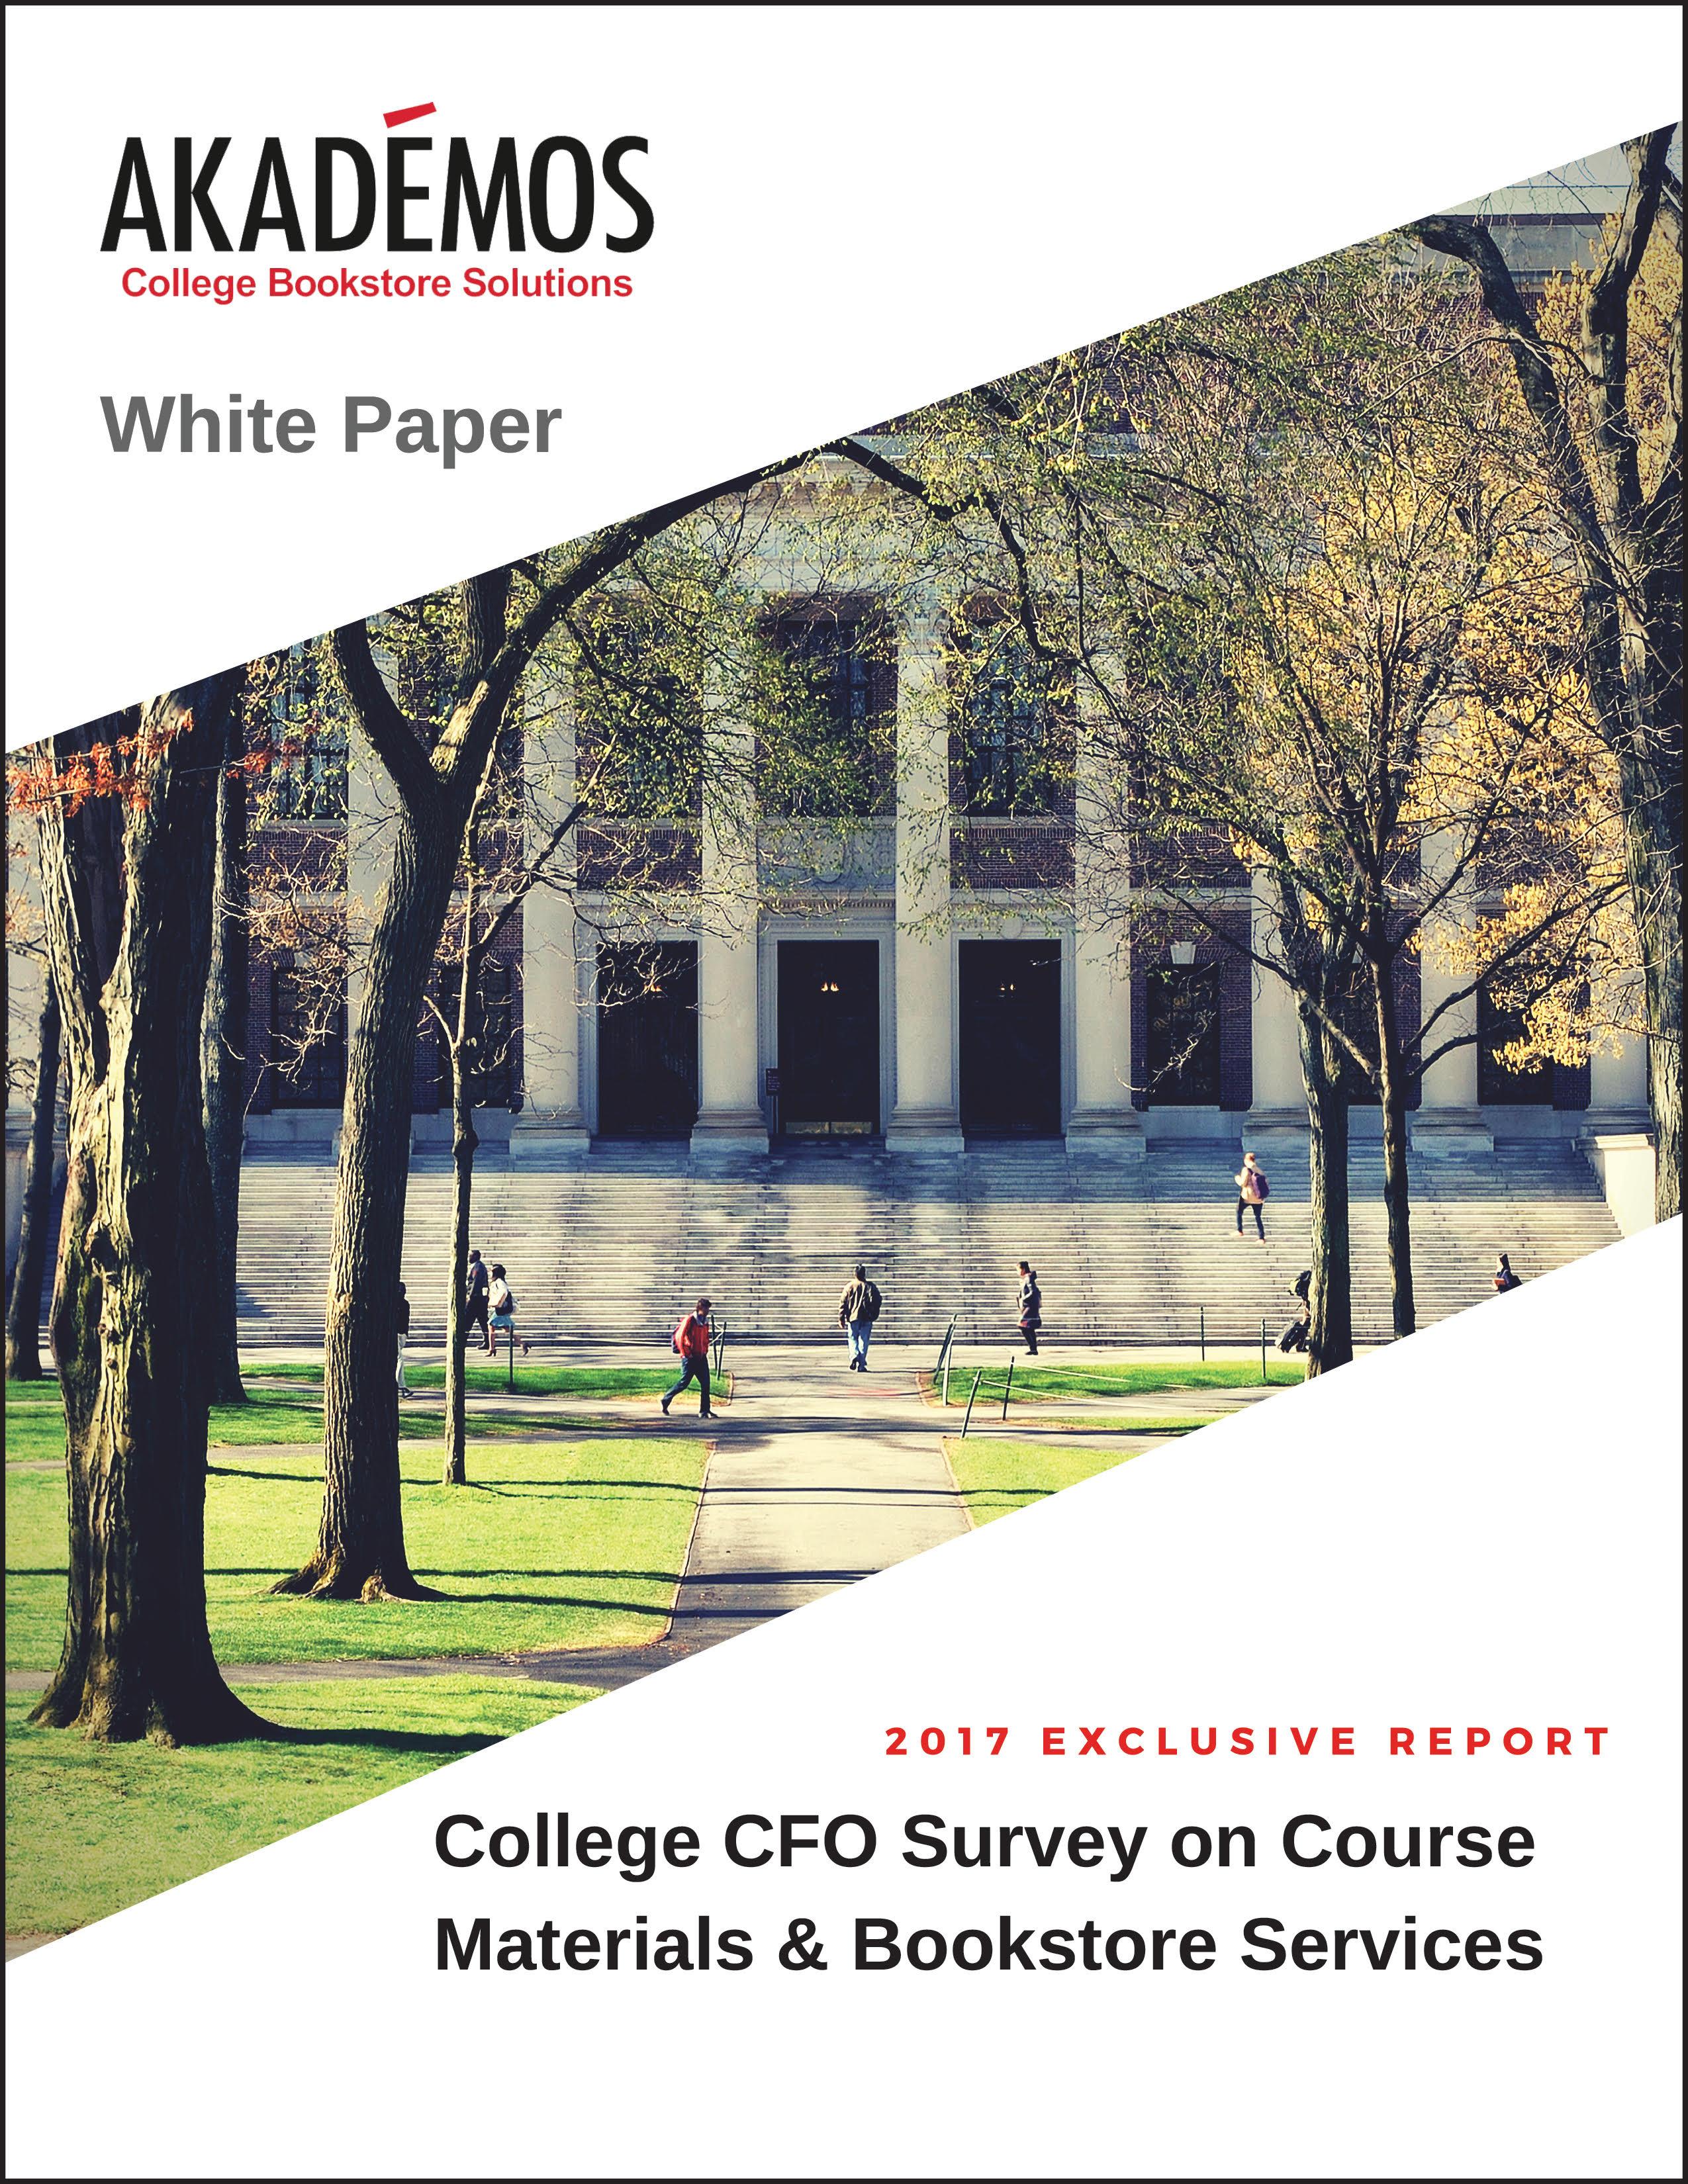 White Paper Thumbnauk.jpg